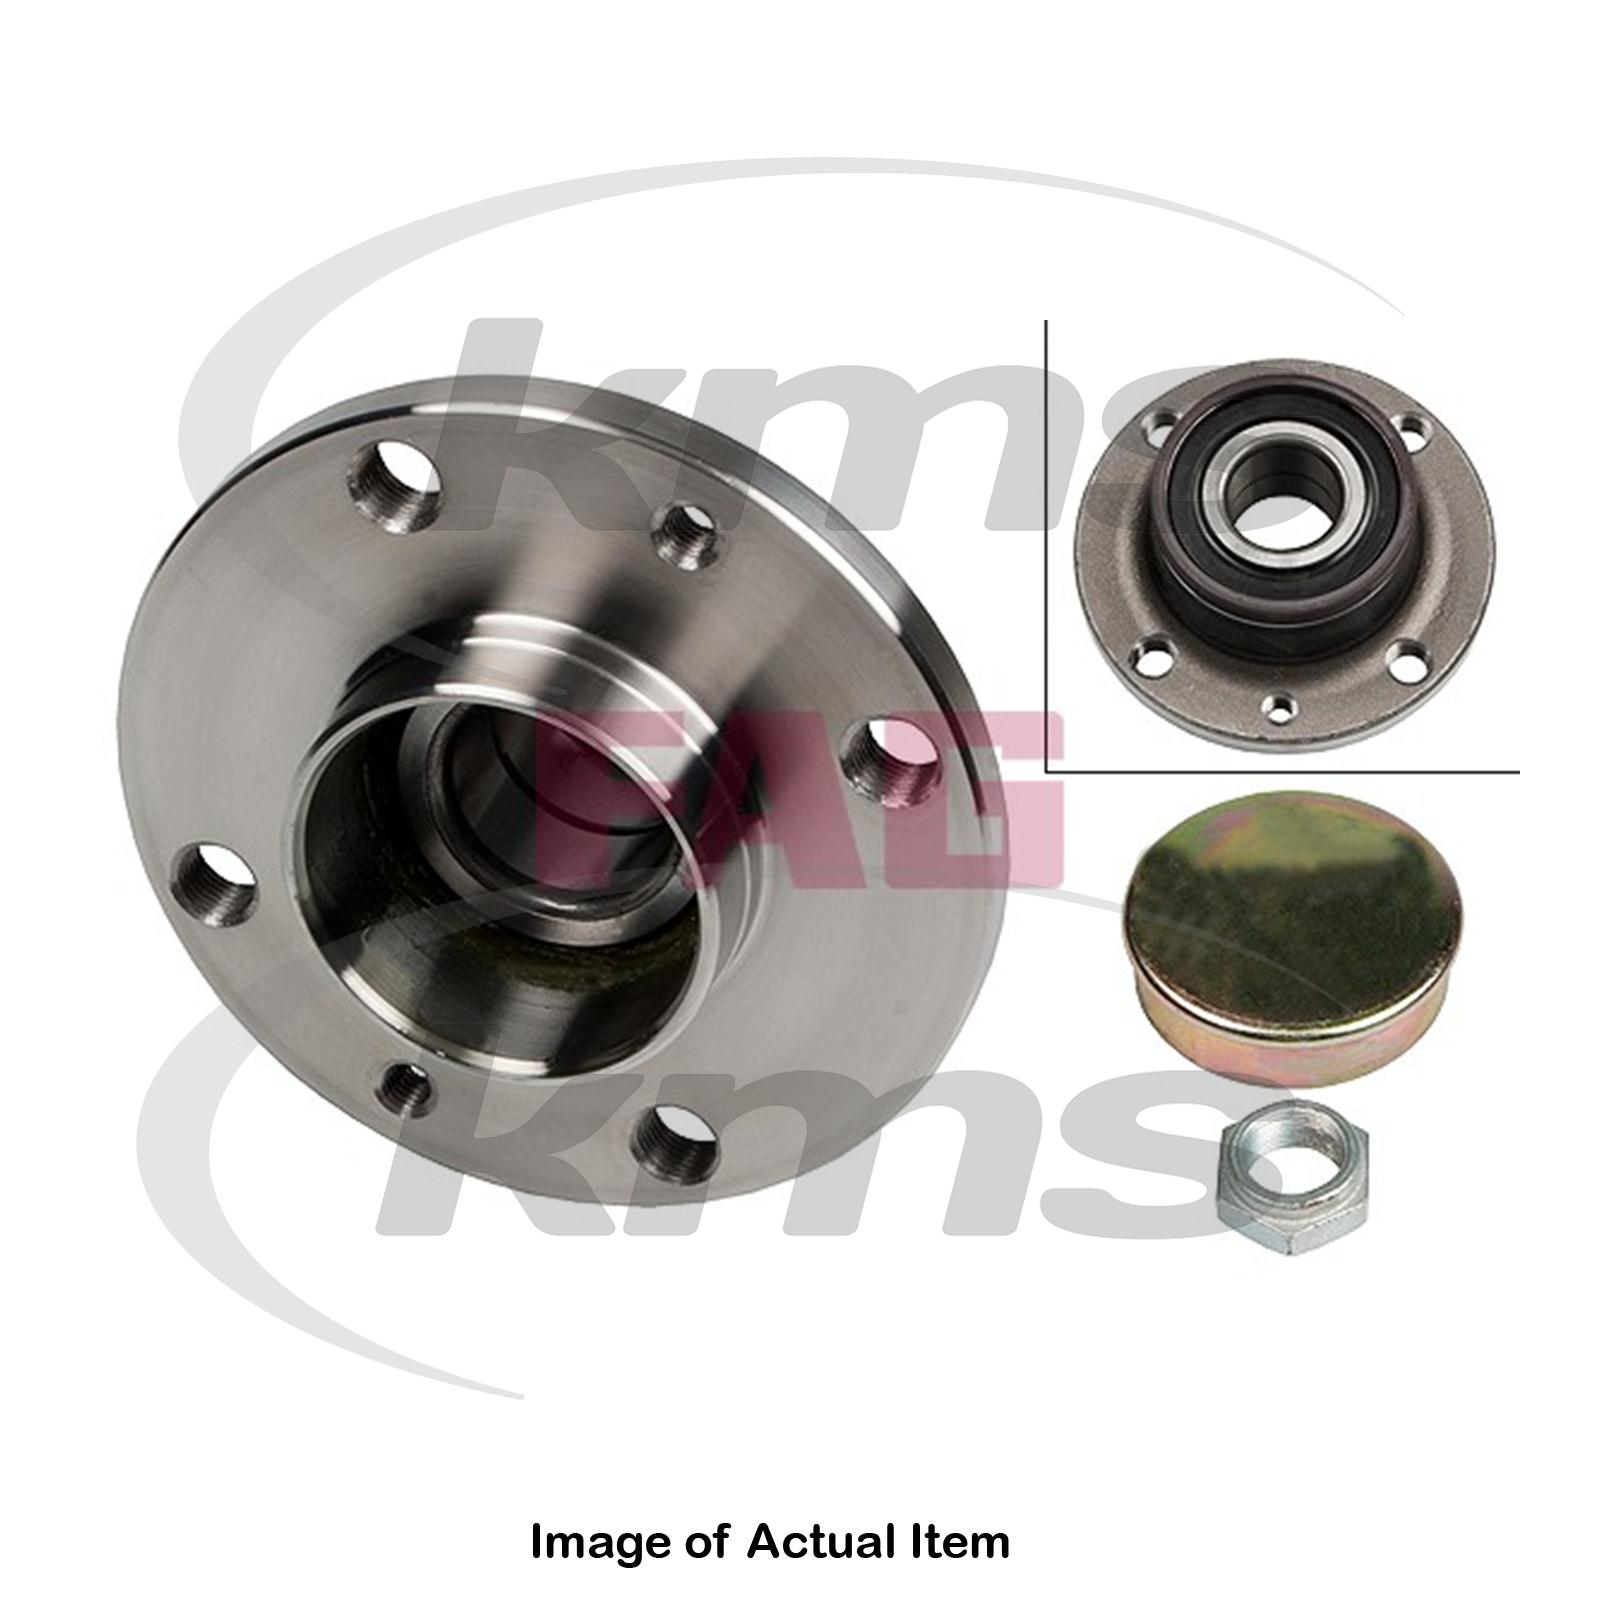 Febi Wheel Hub Inc Bearing 19345 OEM 51754193